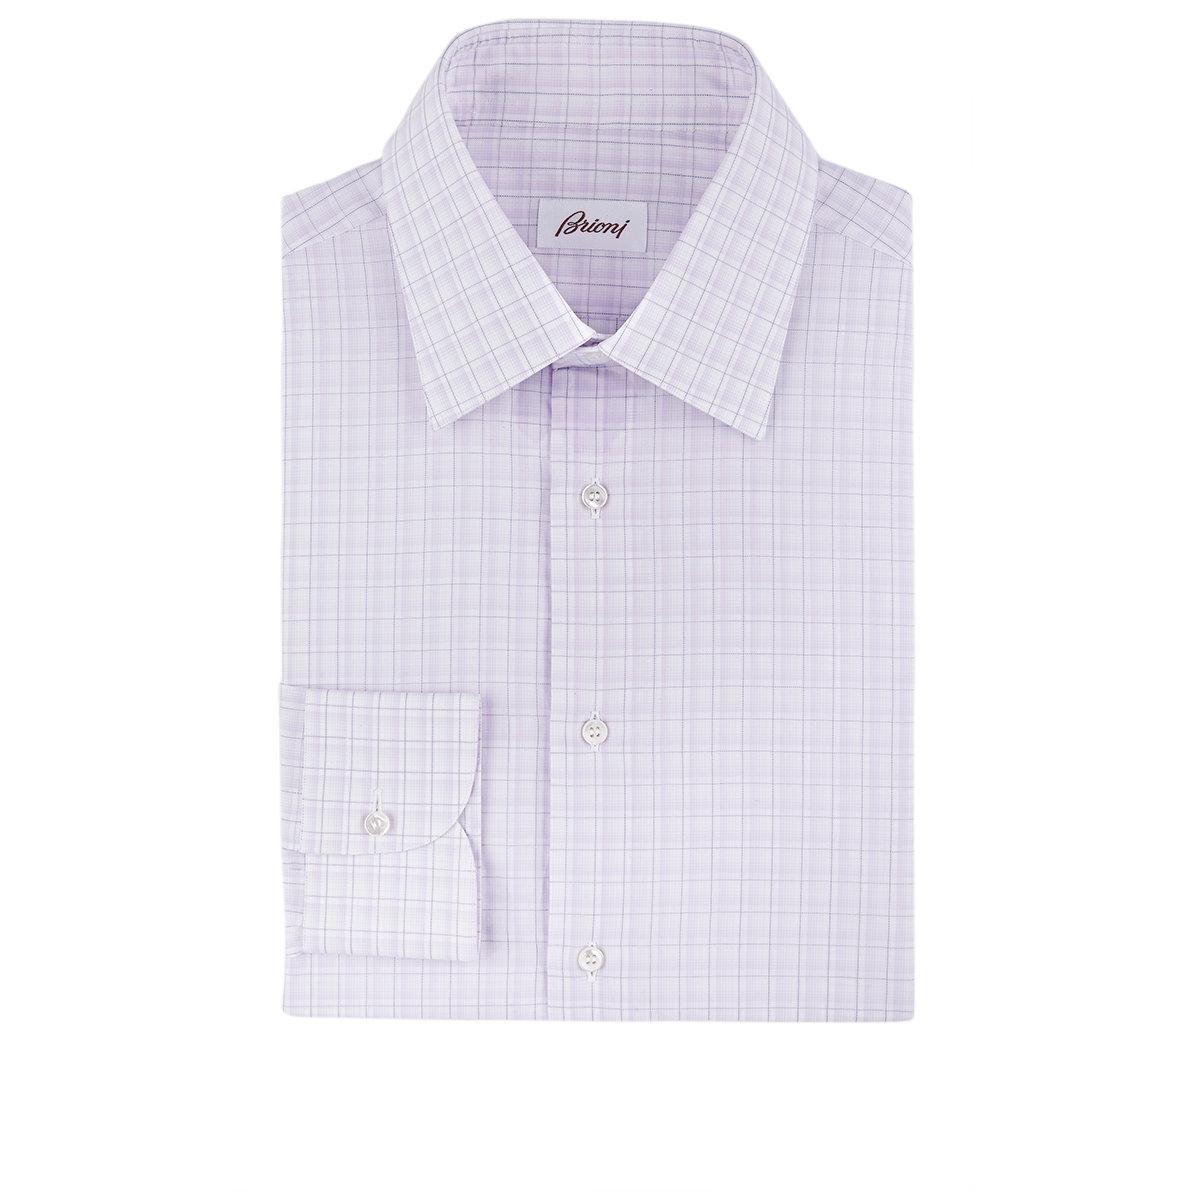 lyst brioni plaid dress shirt in purple for men